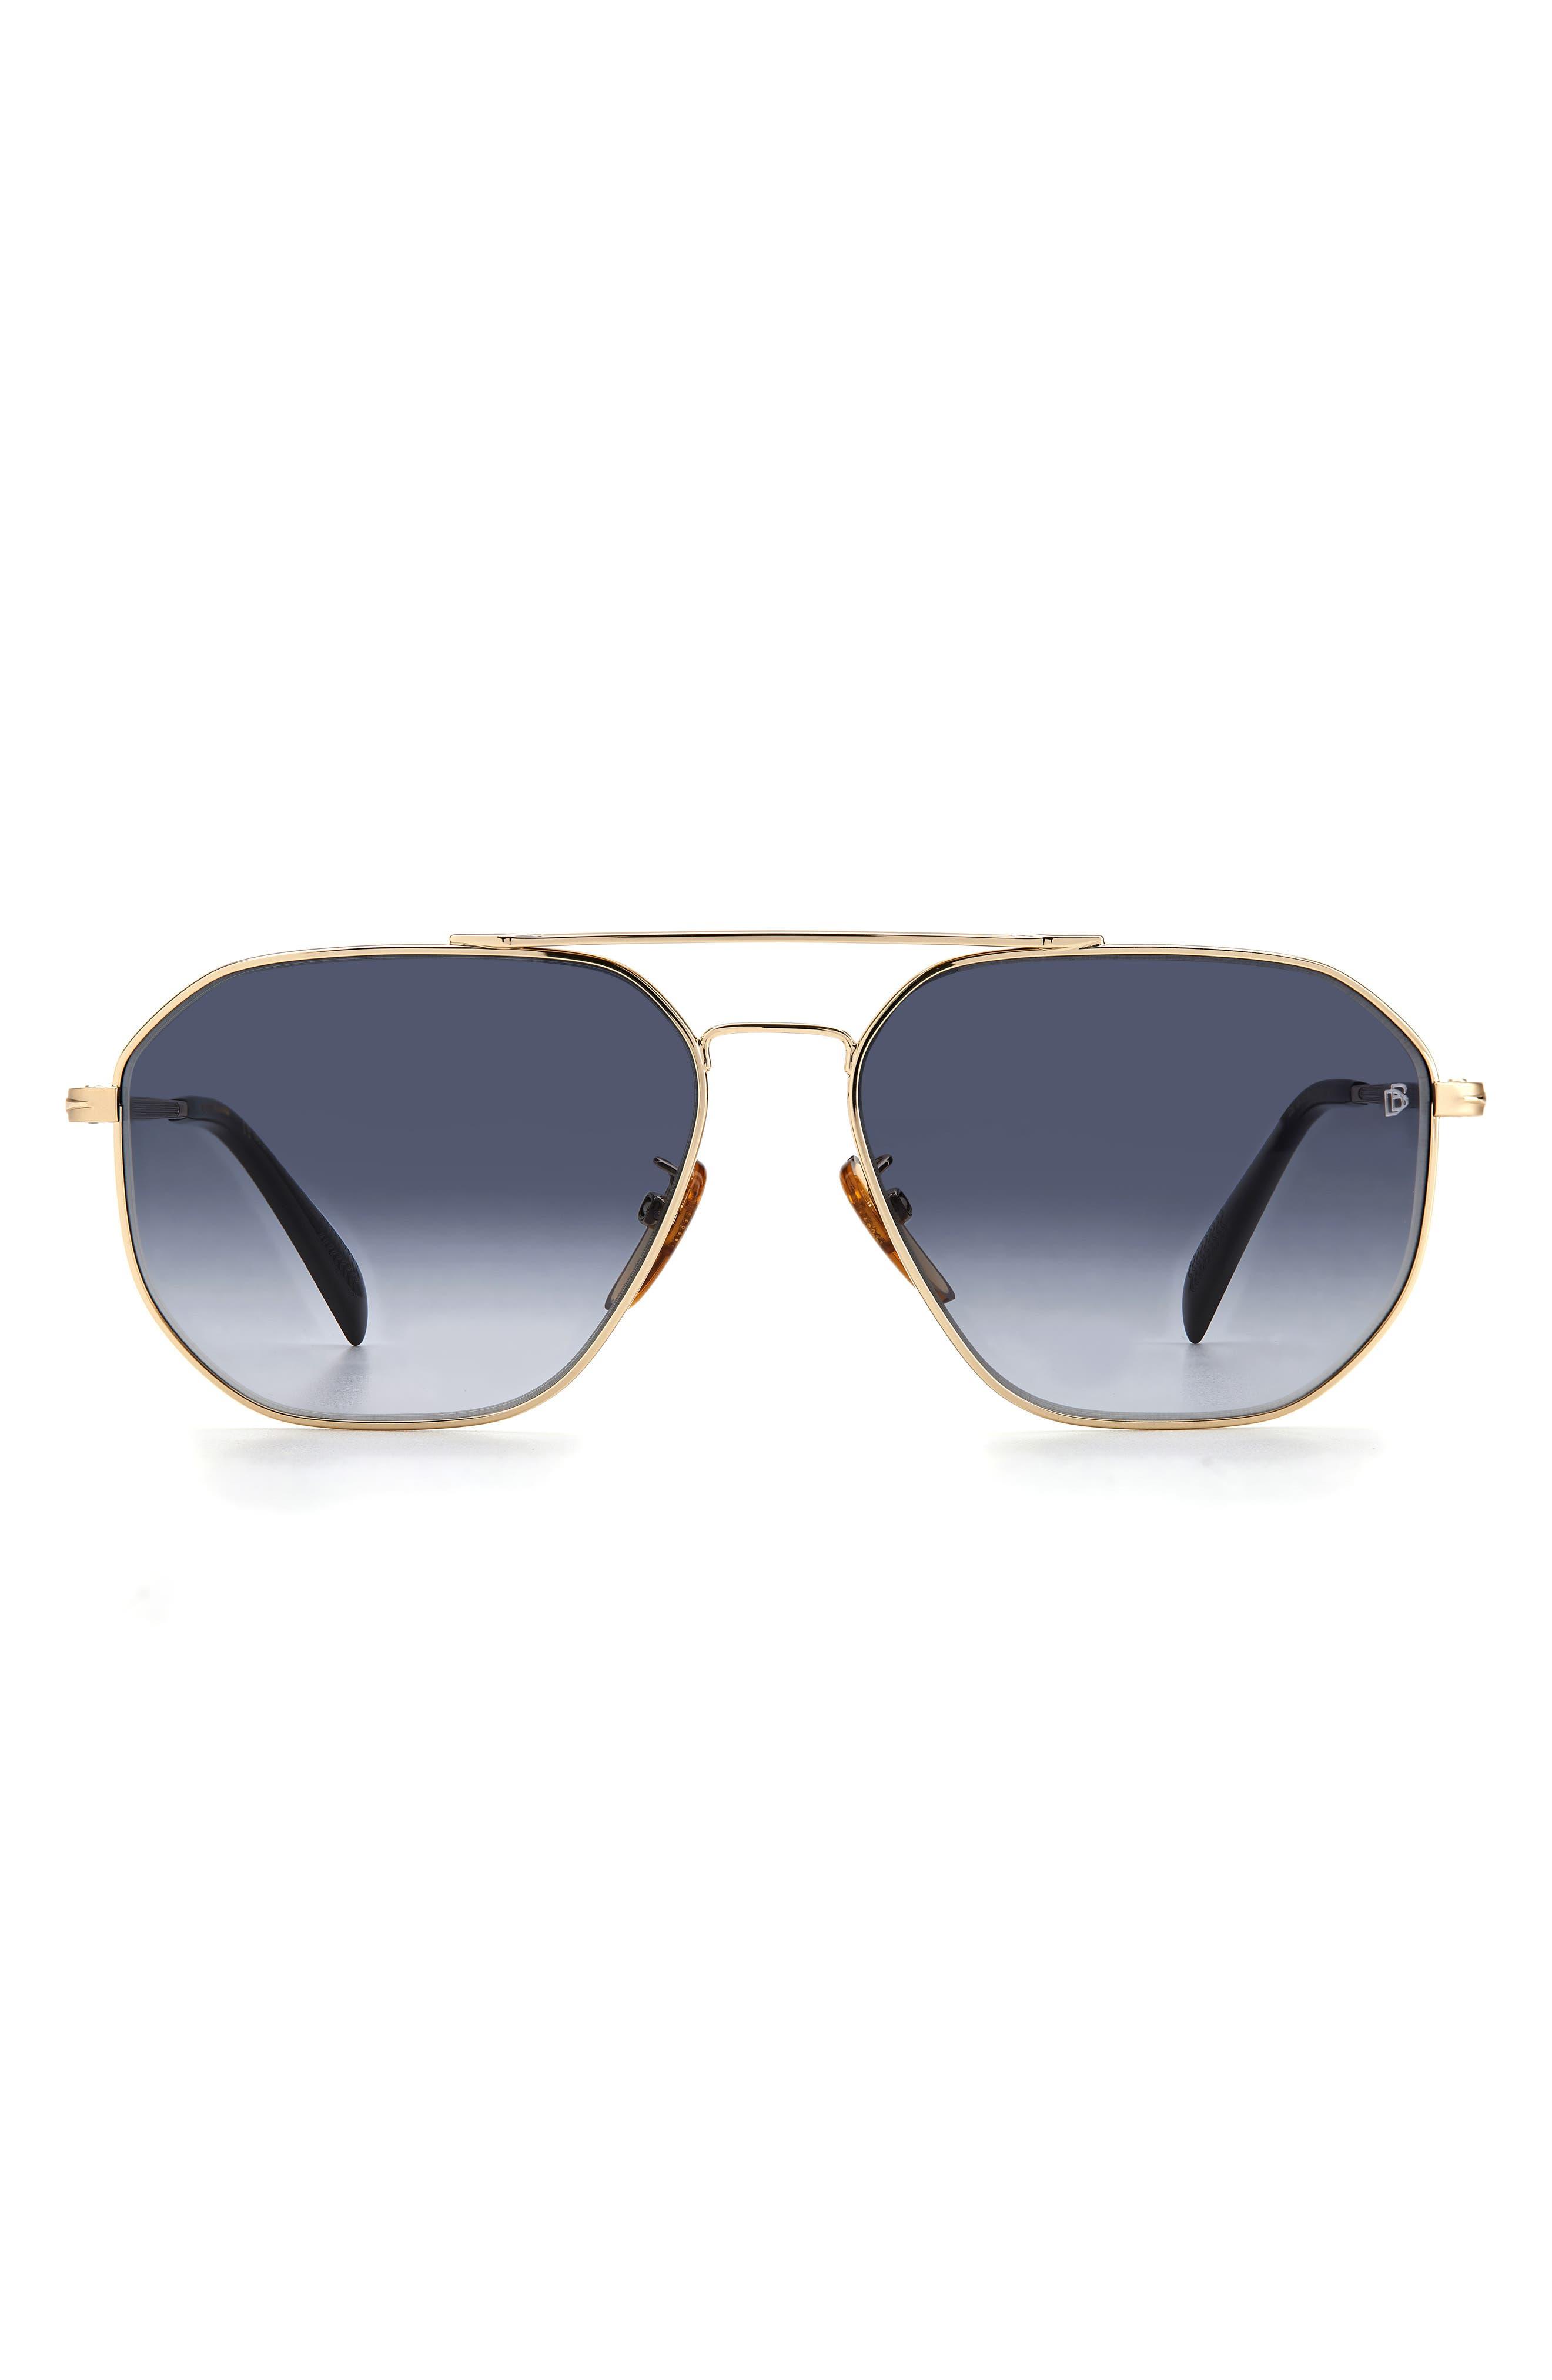 Men's David Beckham 60mm Aviator Sunglasses